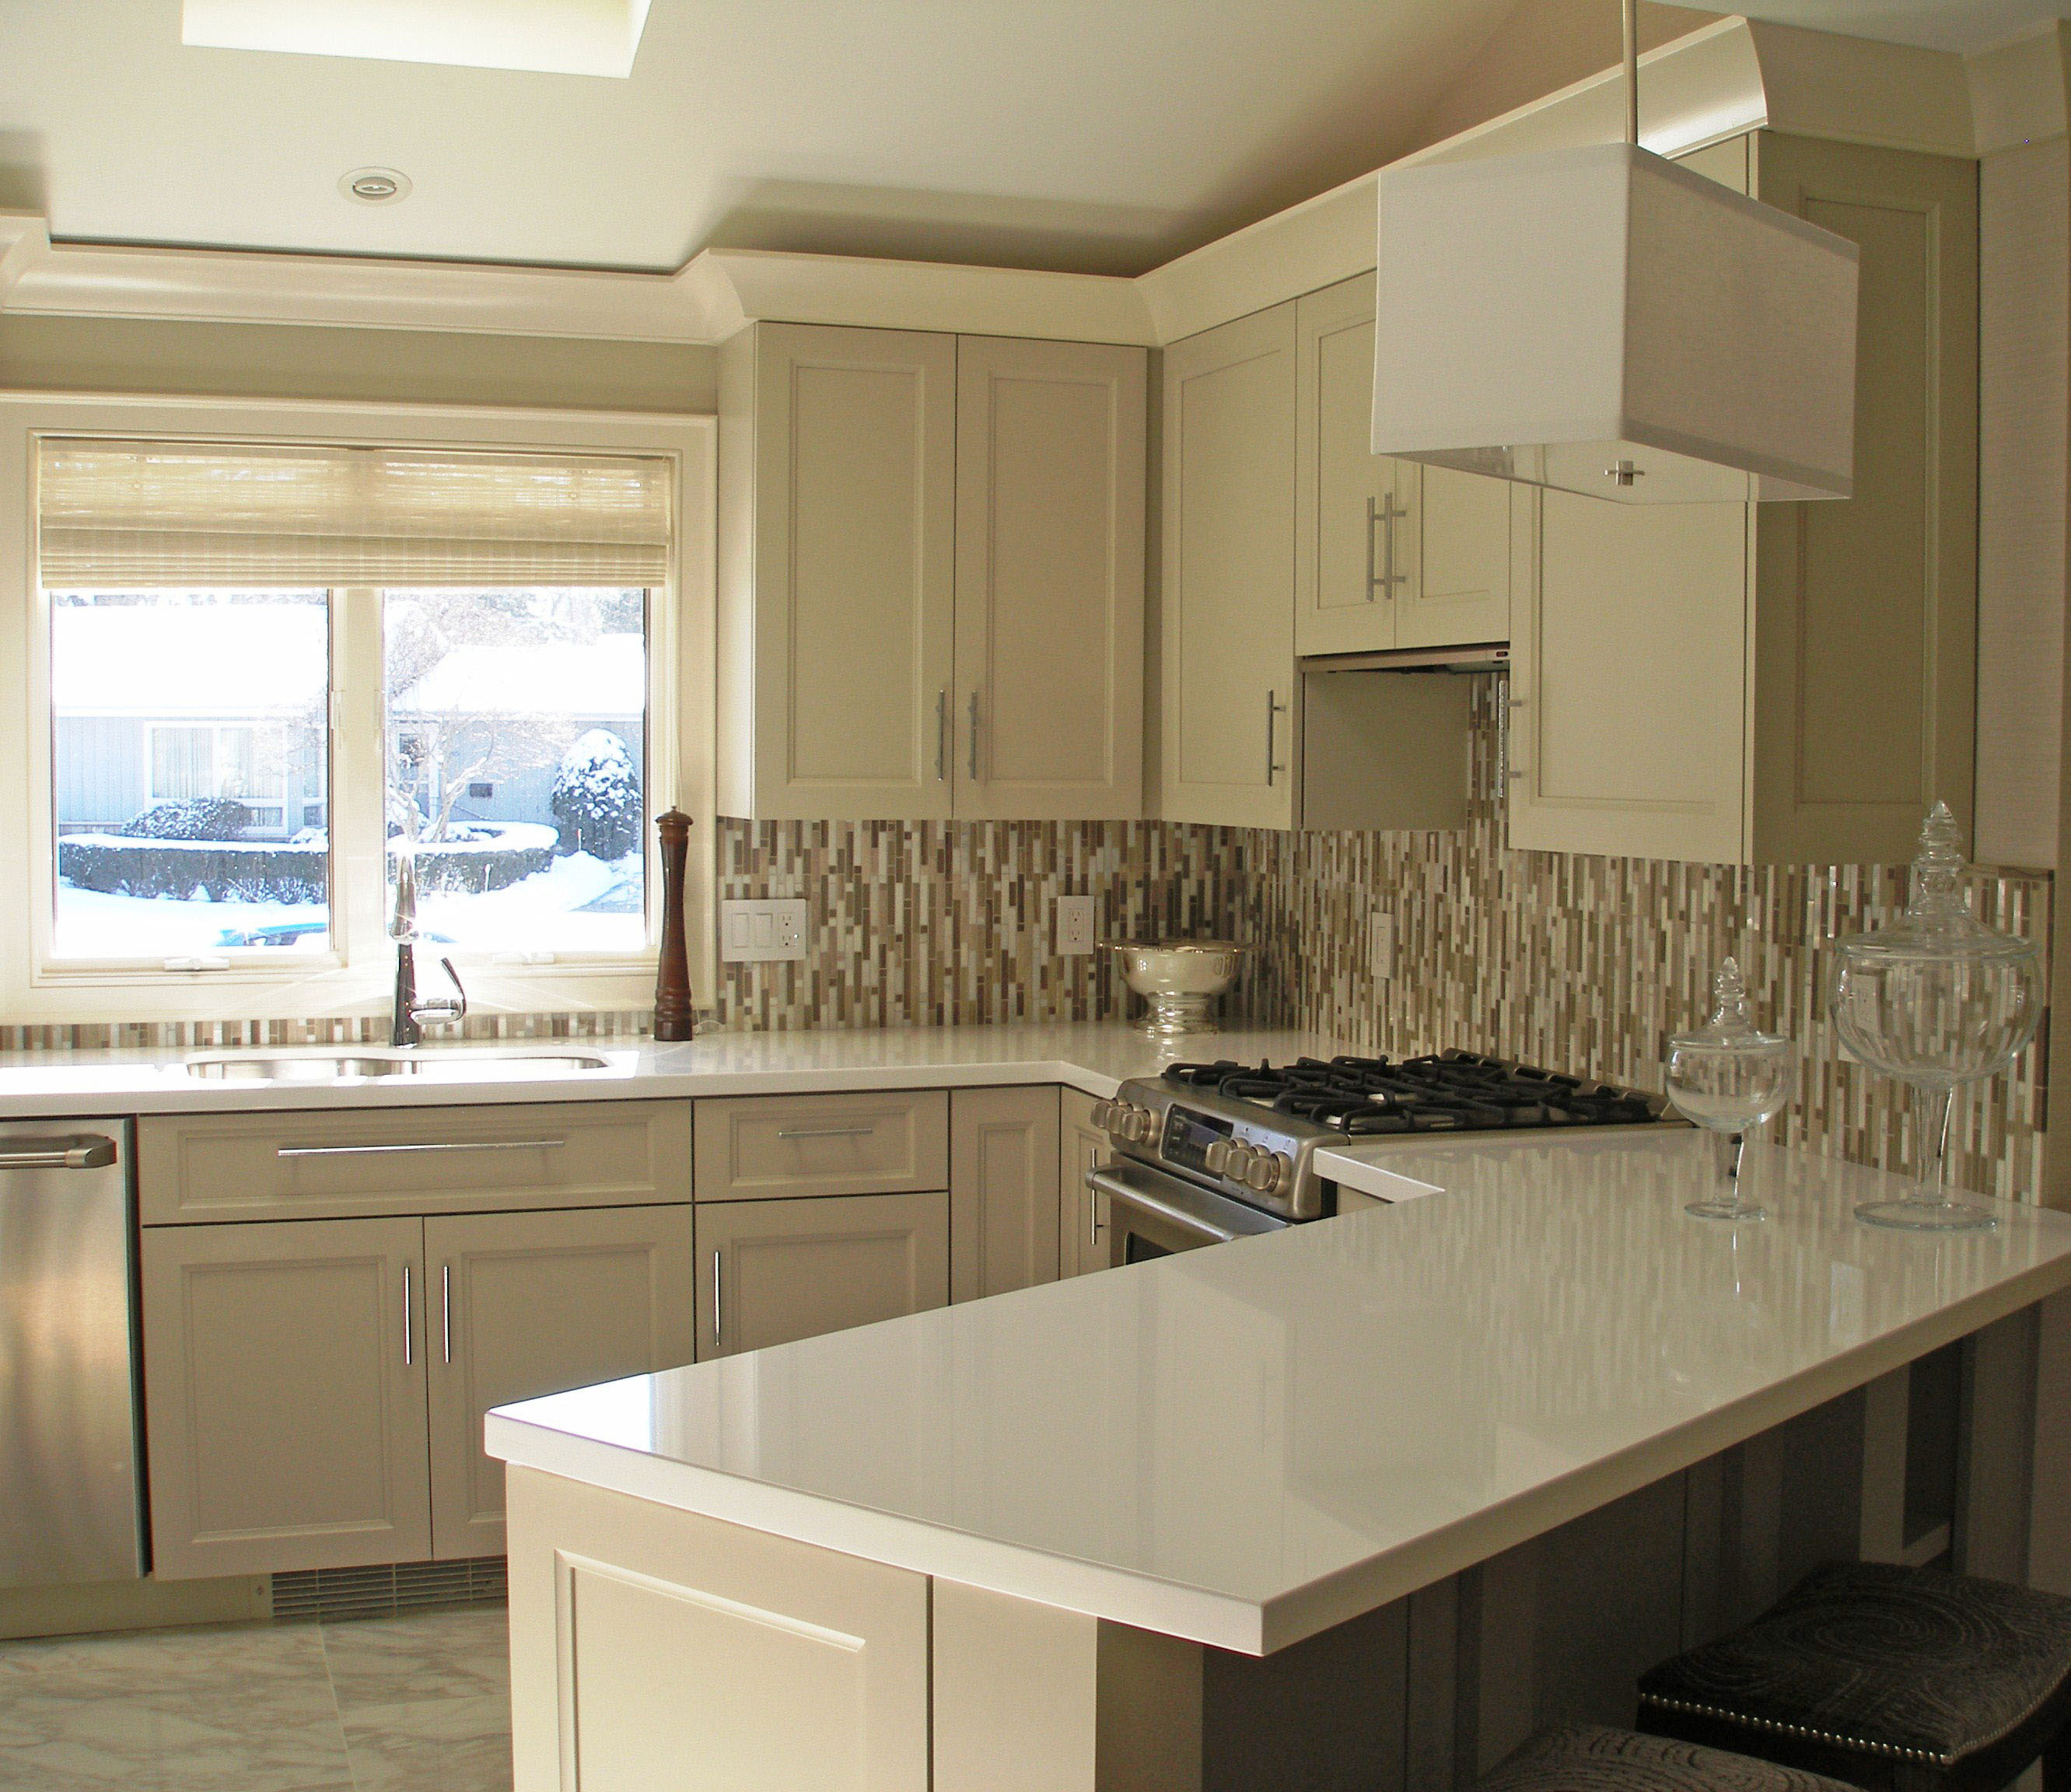 Incroyable Crisp Clean European Full Overlay Cabinets ...